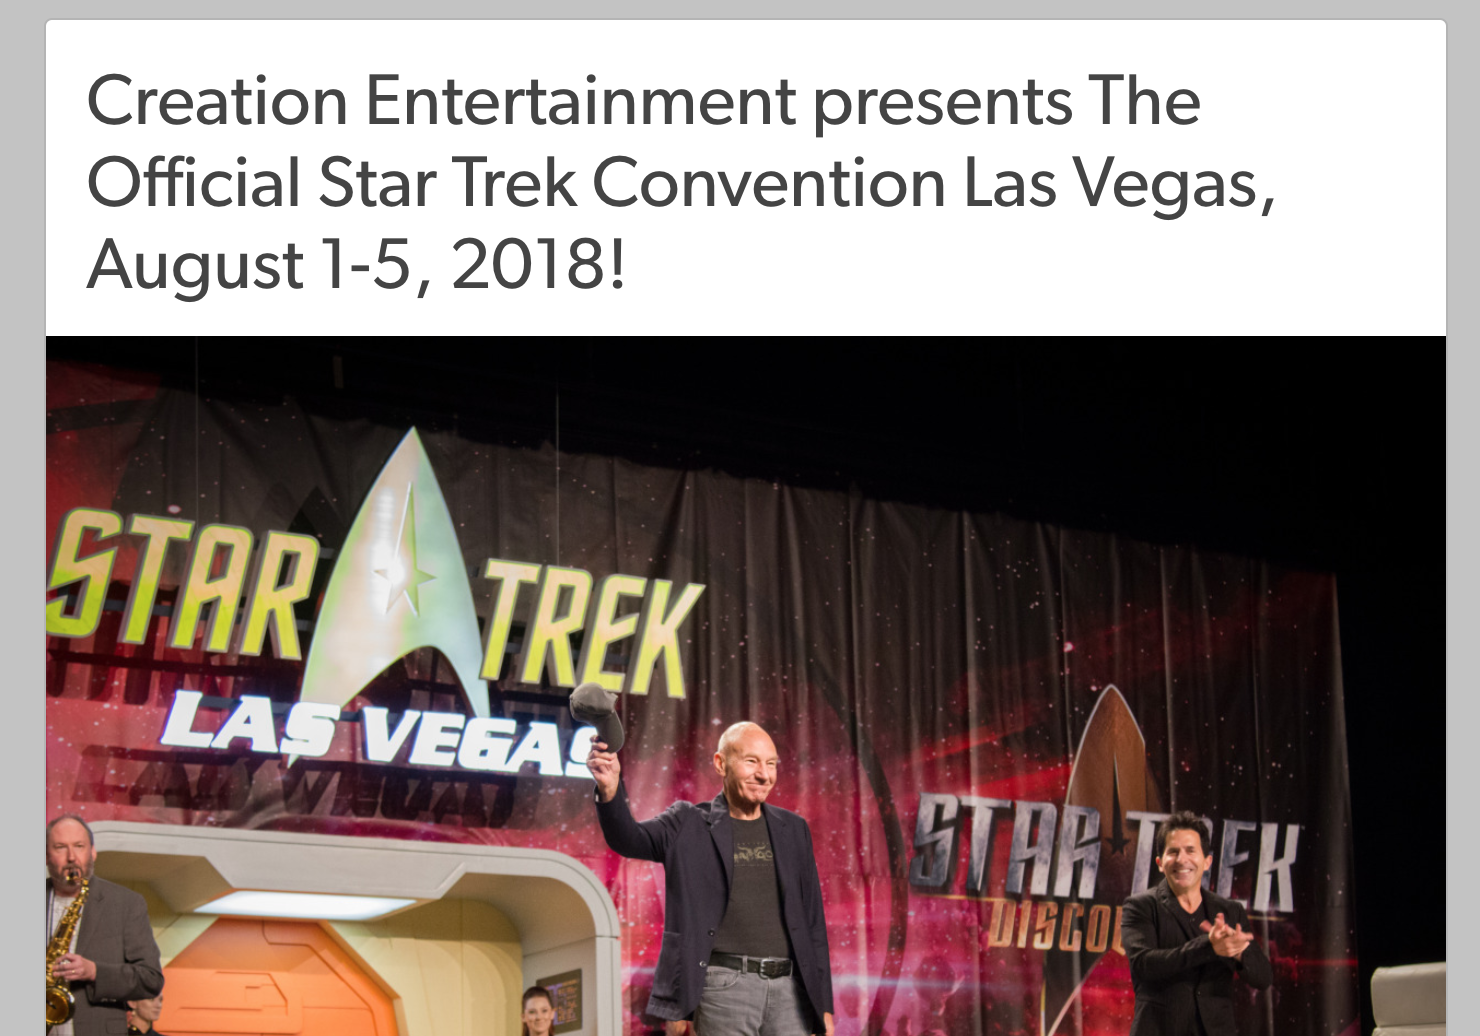 Star Trek Las Vegas Convention Announcement